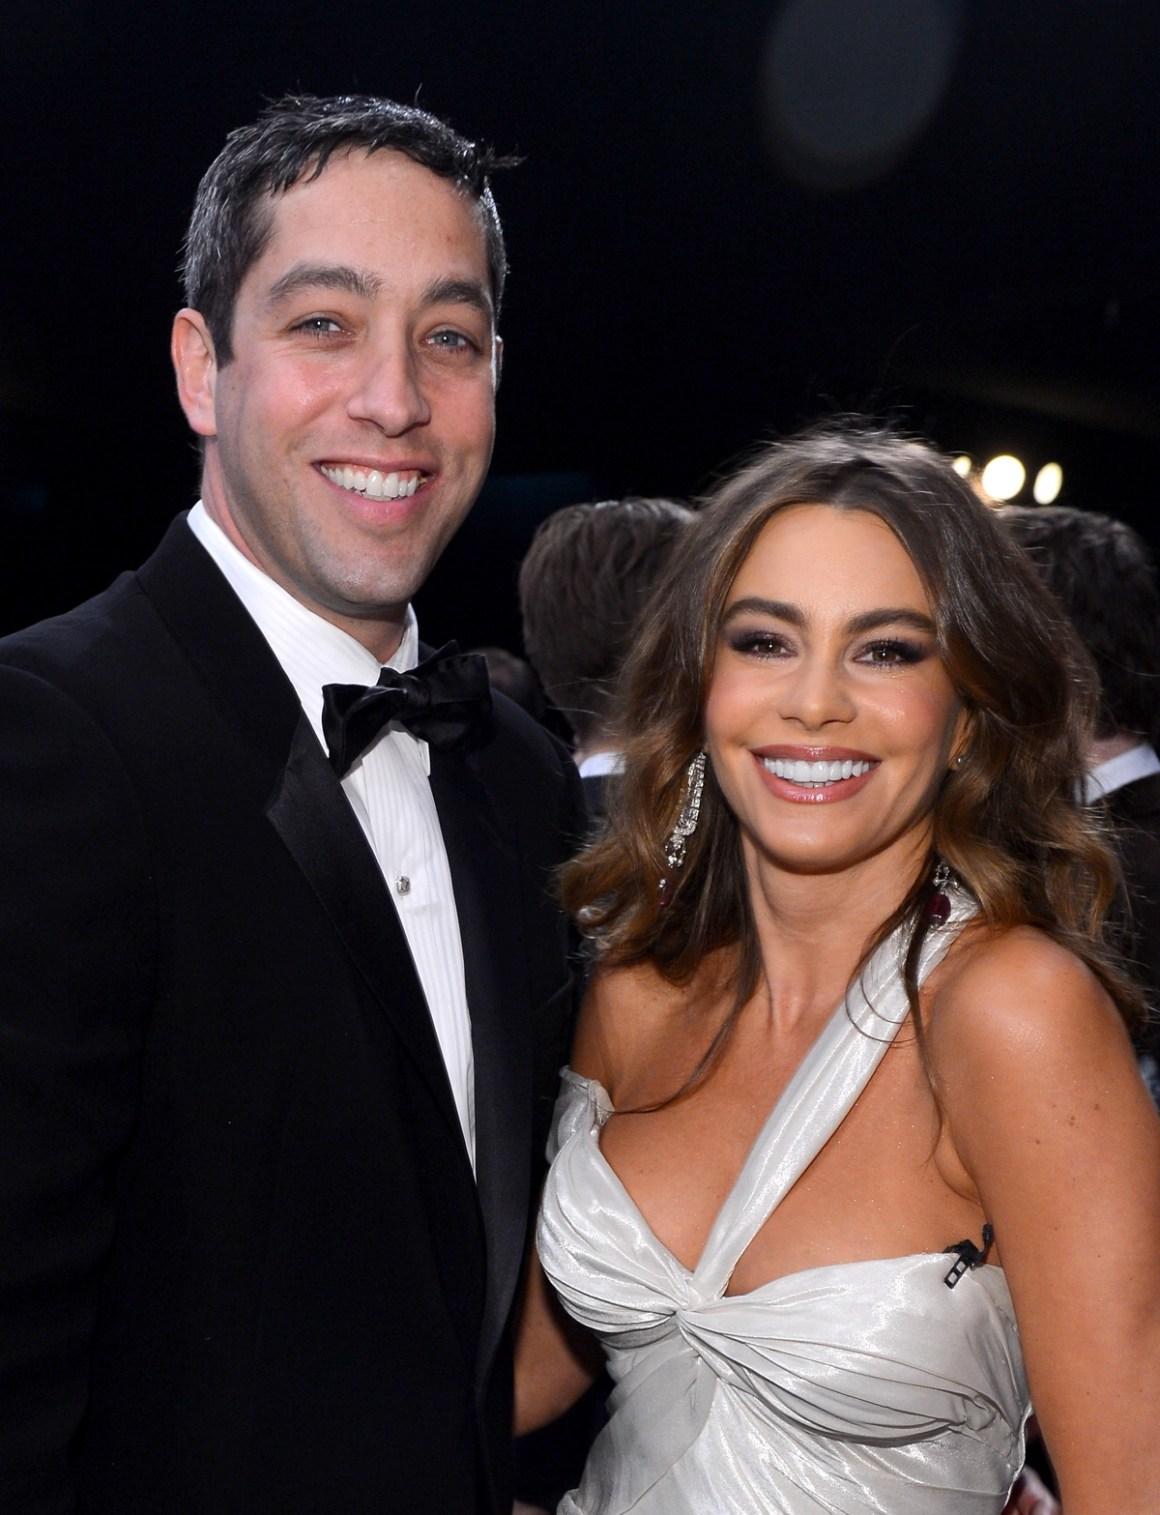 Sofia Vergara and Nick Loeb 19th Annual Screen Actors Guild Awards - Show